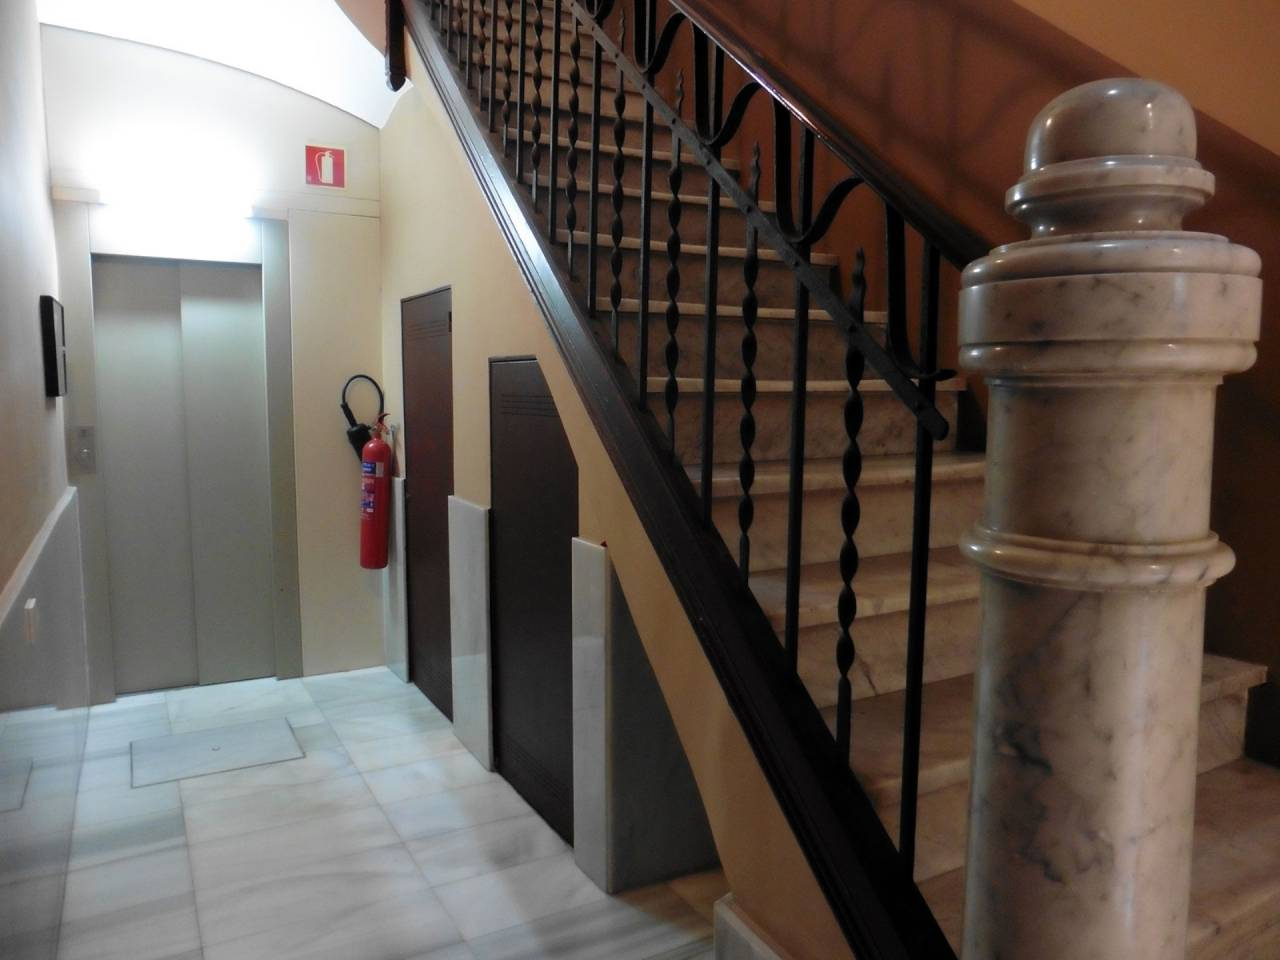 Pis a lloguer Sants-Badal (Barcelona Capital)